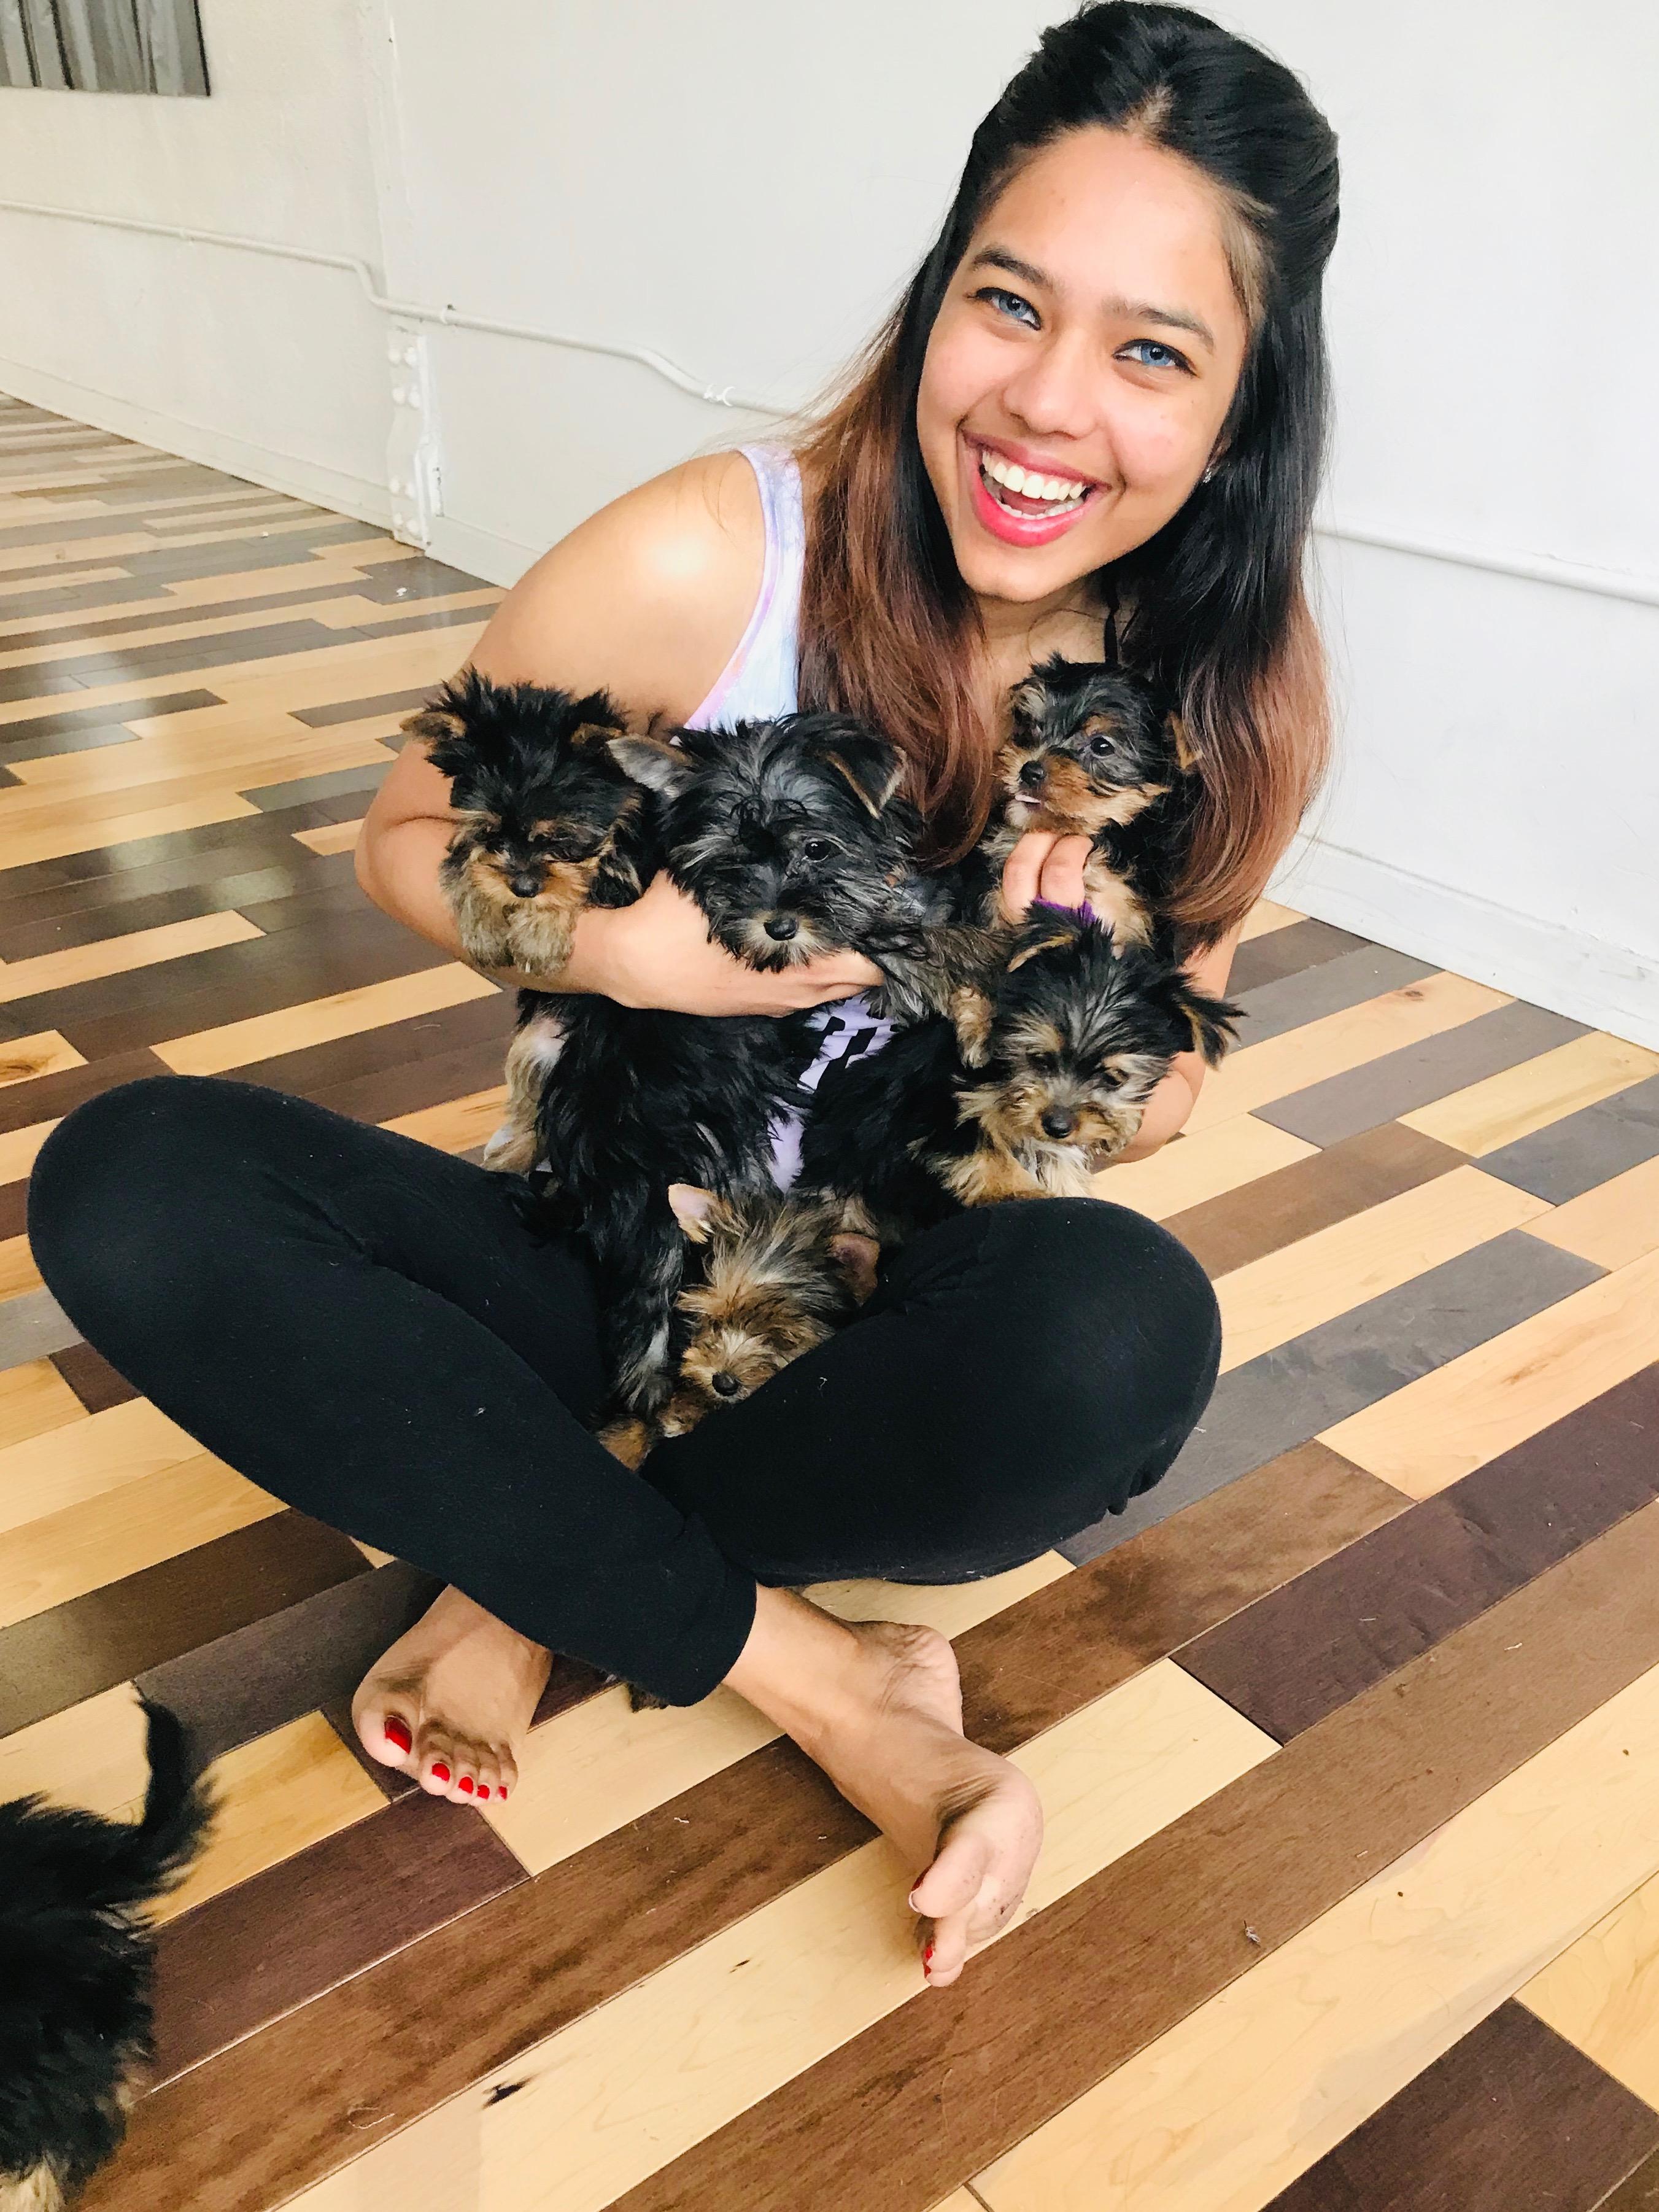 Hugging Puppies